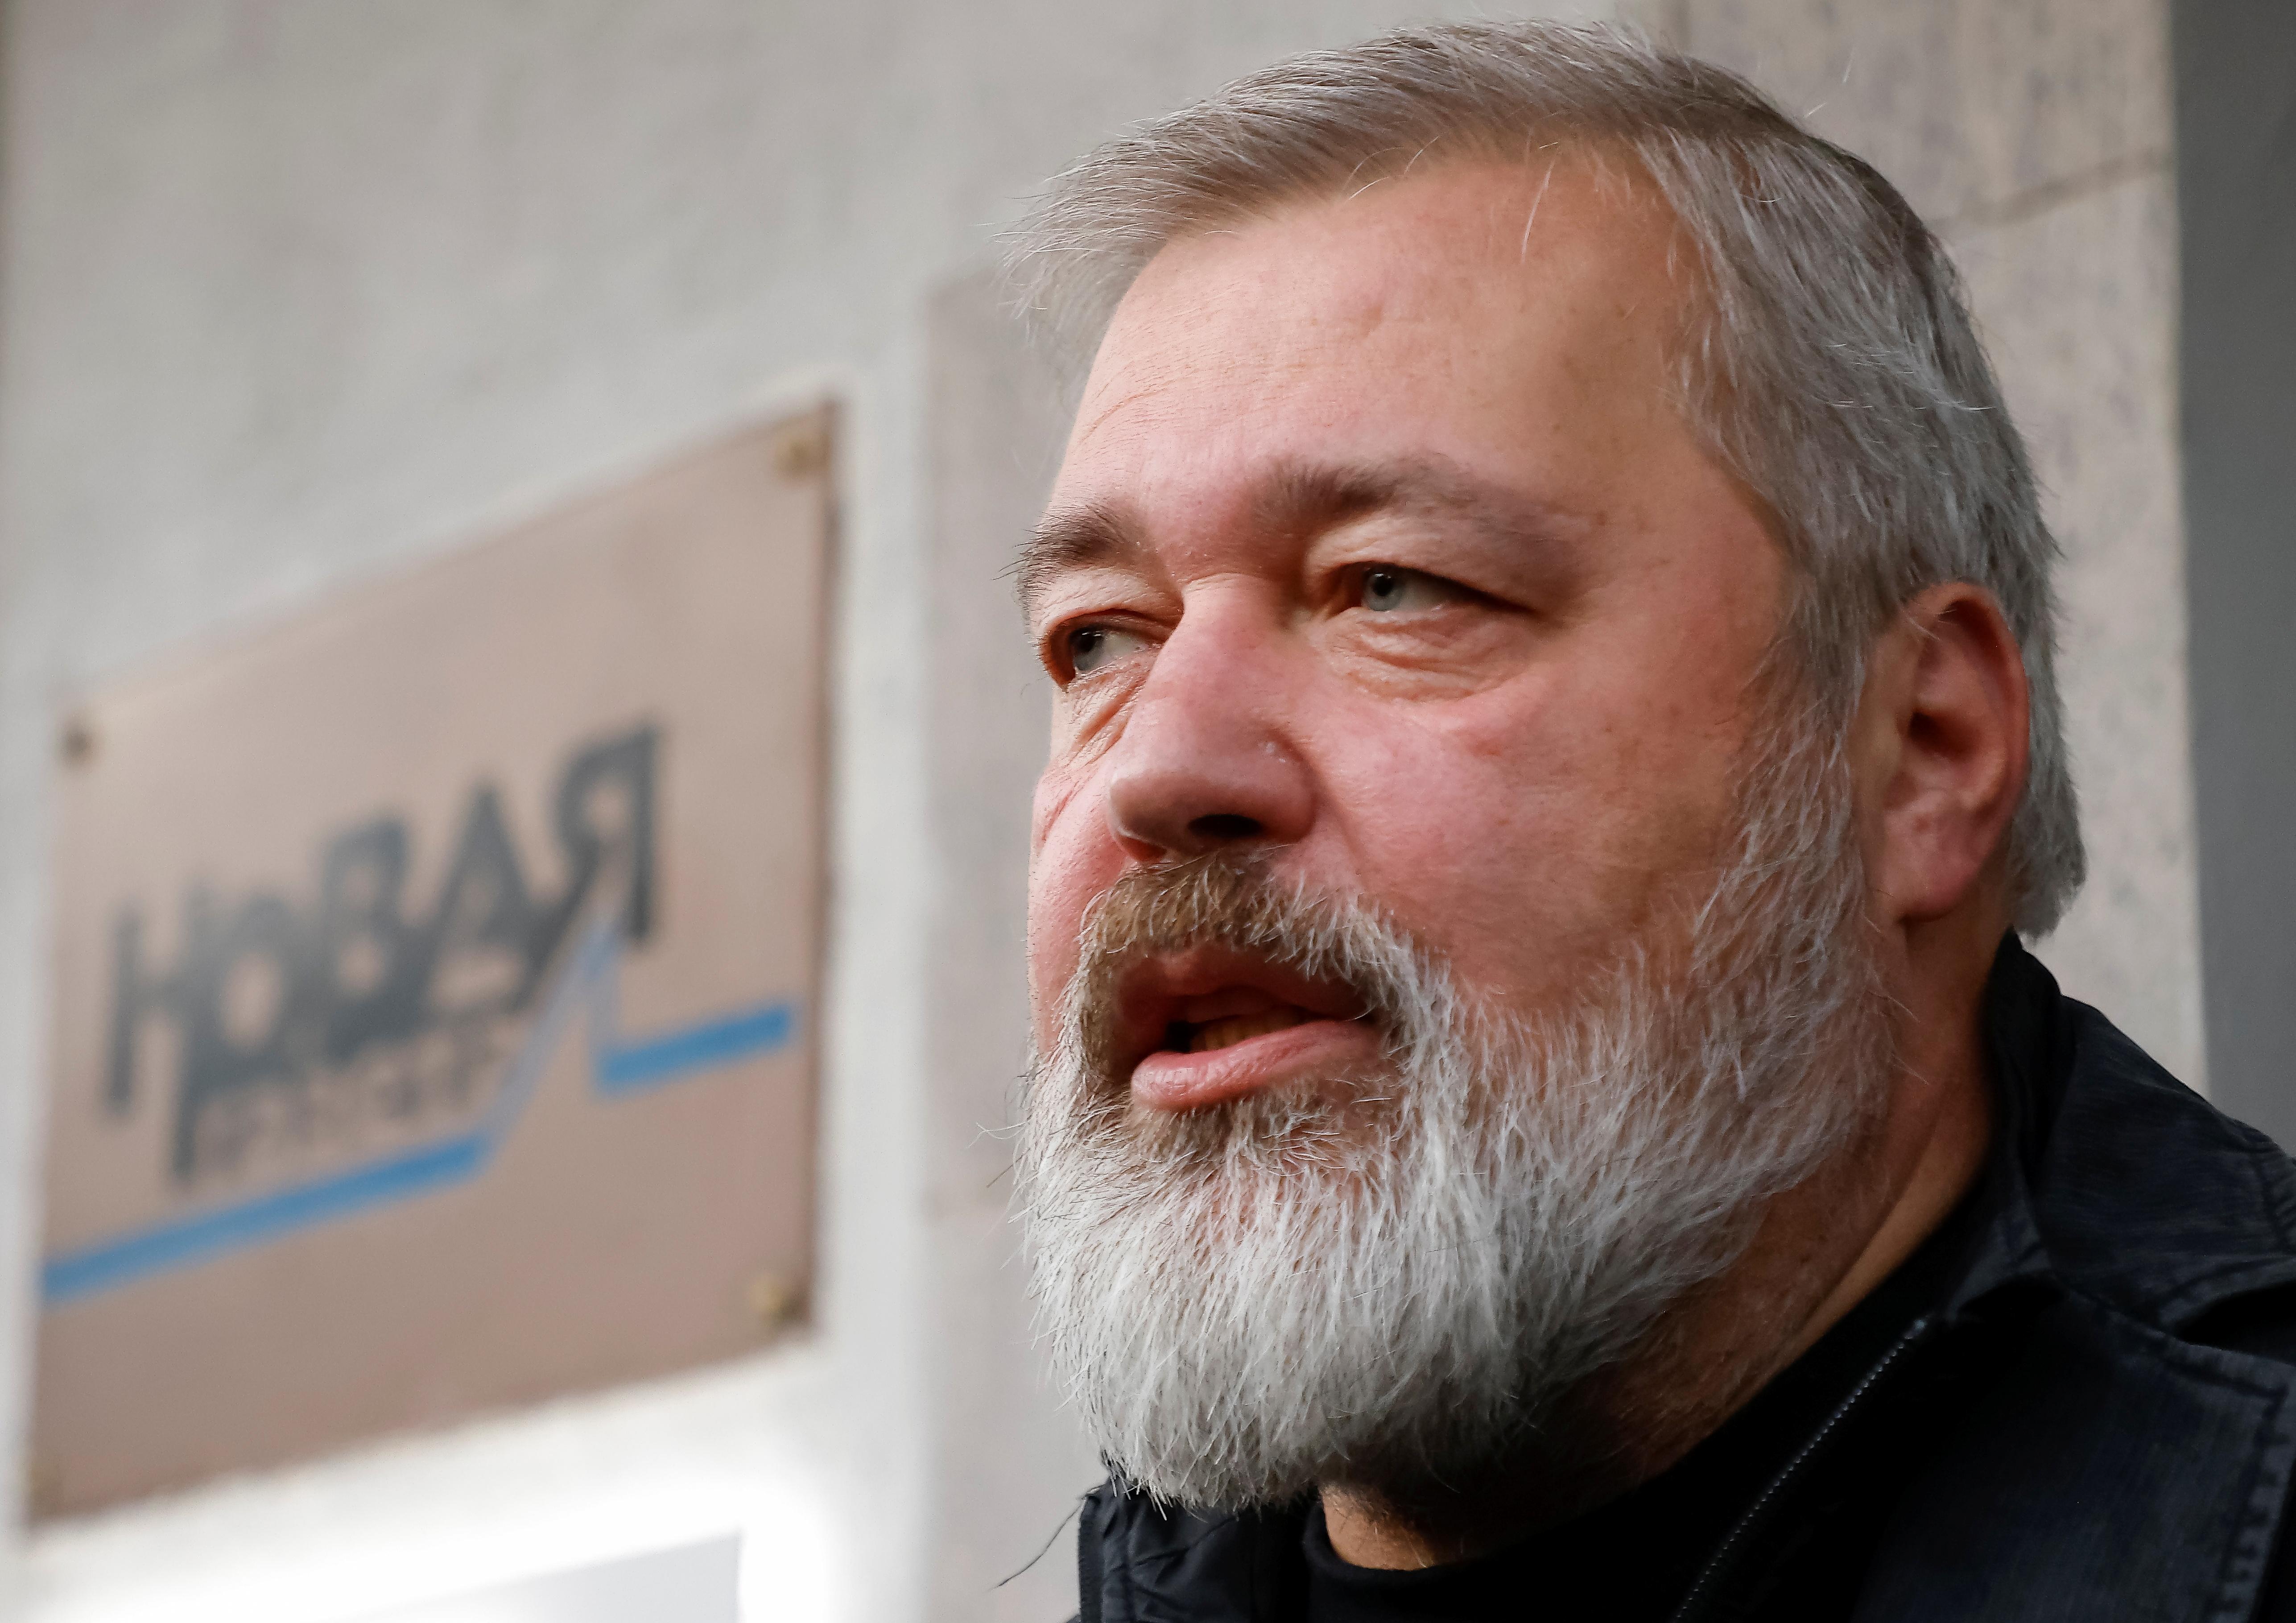 Russian investigative newspaper Novaya Gazeta's editor-in-chief Dmitry Muratov, one of 2021 Nobel Peace Prize winners, speaks with journalists in Moscow, Russia October 8, 2021.  REUTERS/Maxim Shemetov